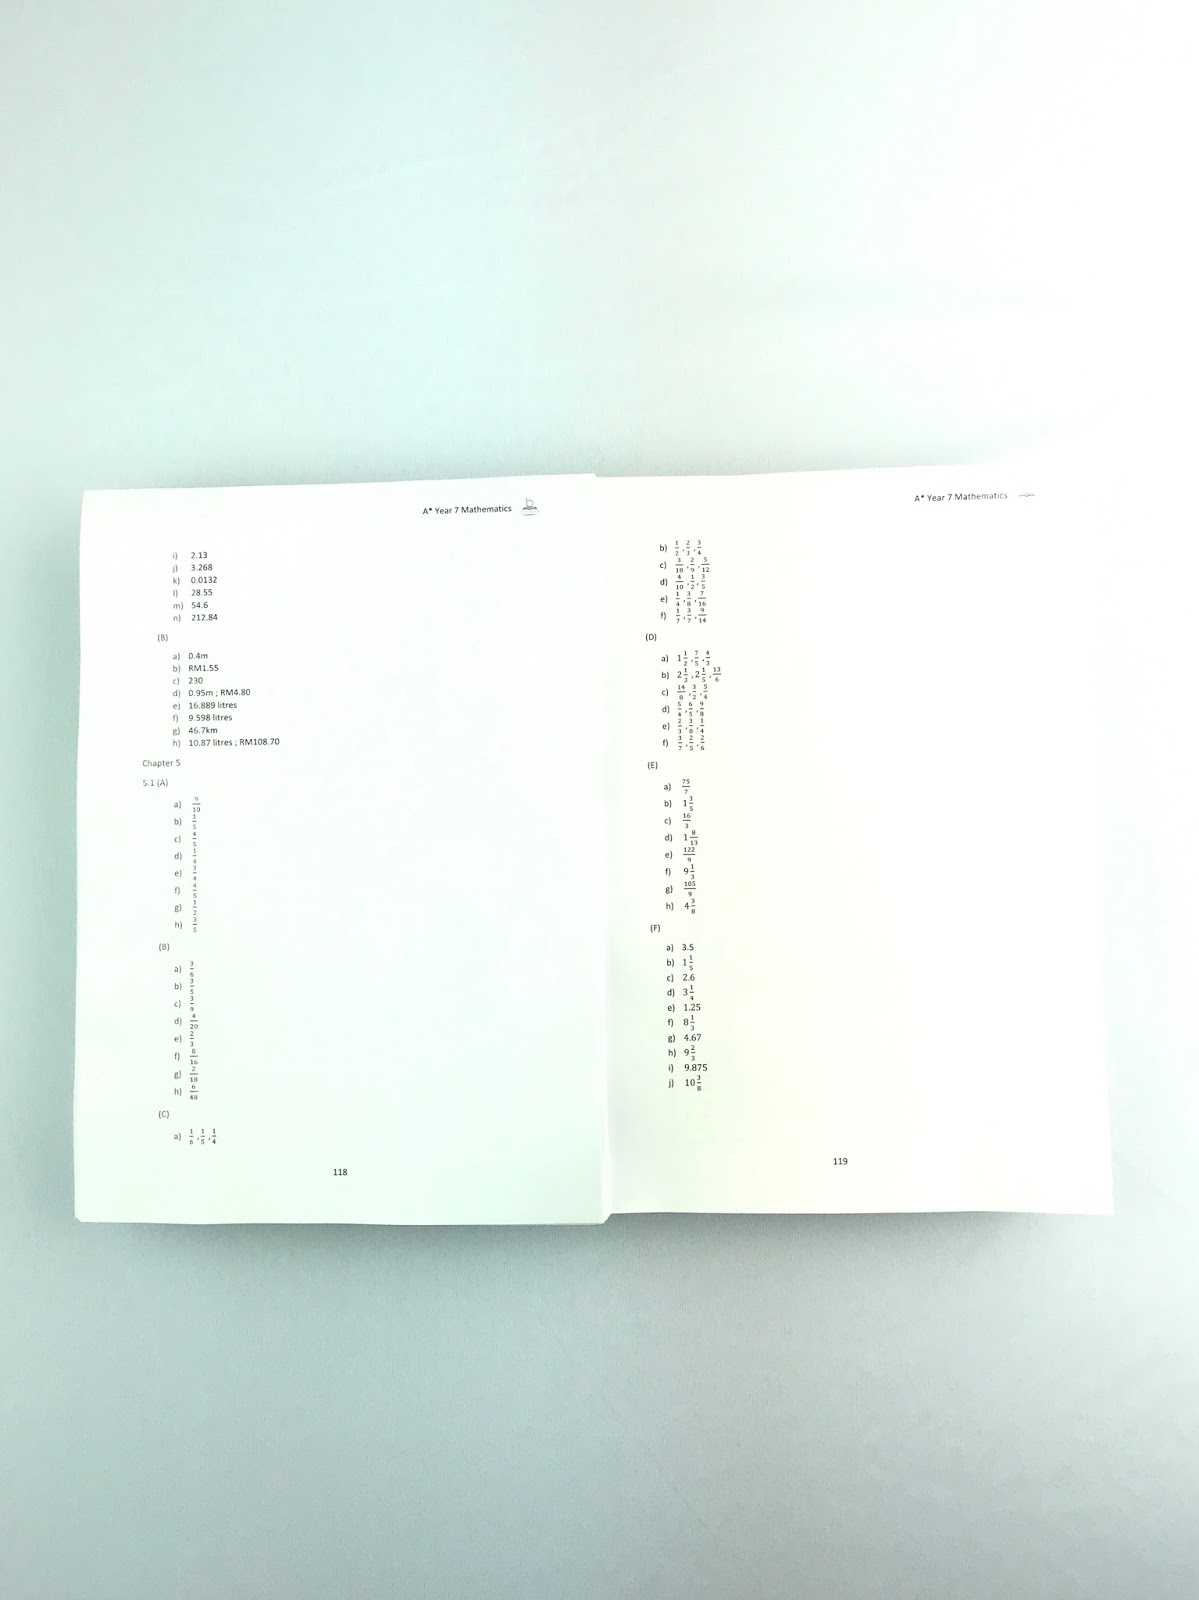 Workbooks total transformation workbook : IGCSE A* Workbook - mr sai mun